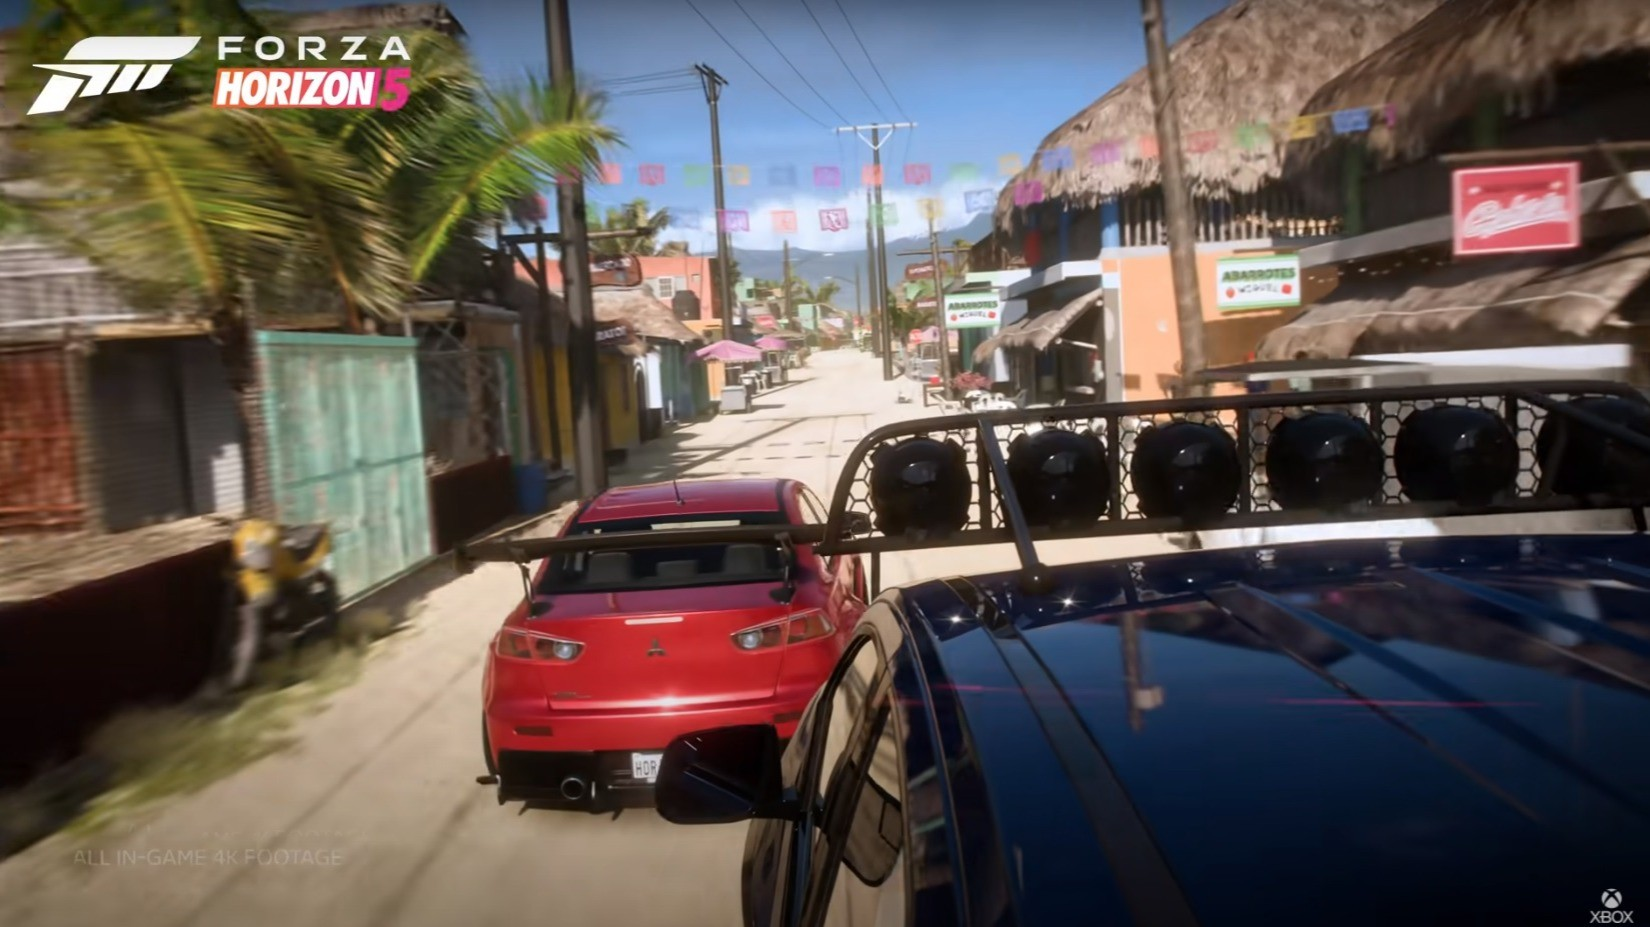 Xbox показала графическую составляющую Forza Horizon 5